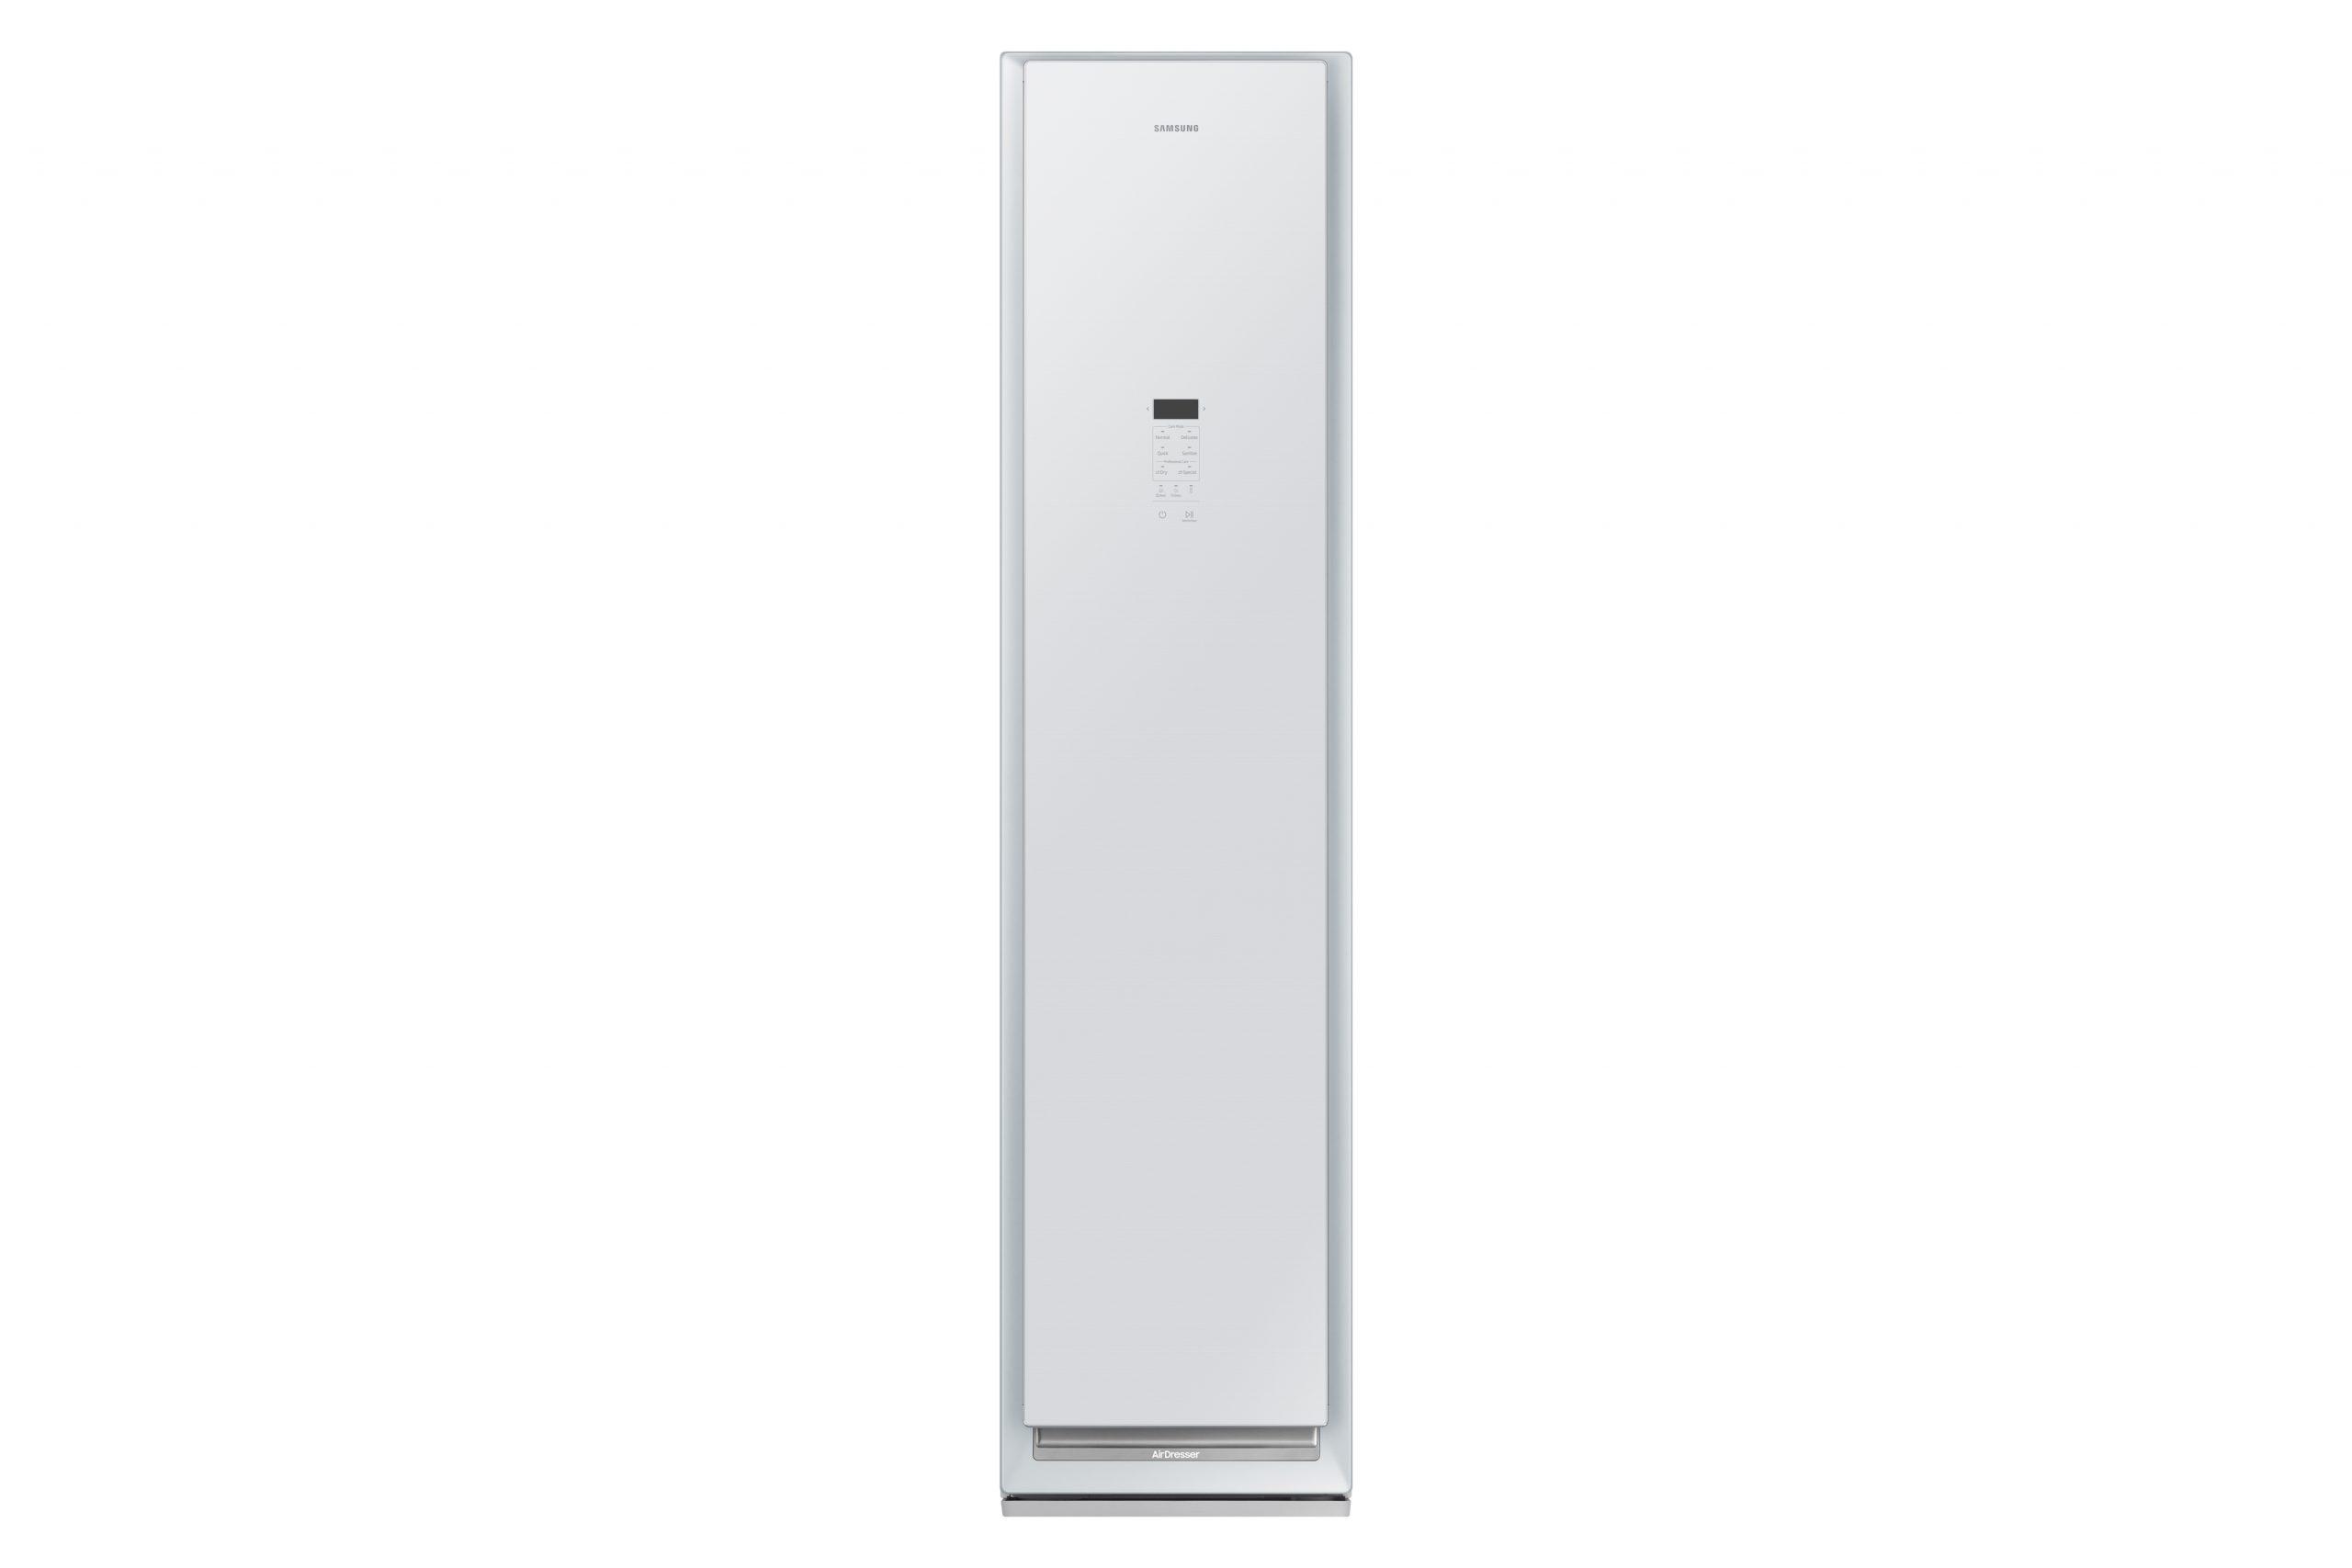 AirDresser 3999 Samsung 1 1 scaled Samsung's New AirDresser Sanitises, Deodorises & Straightens